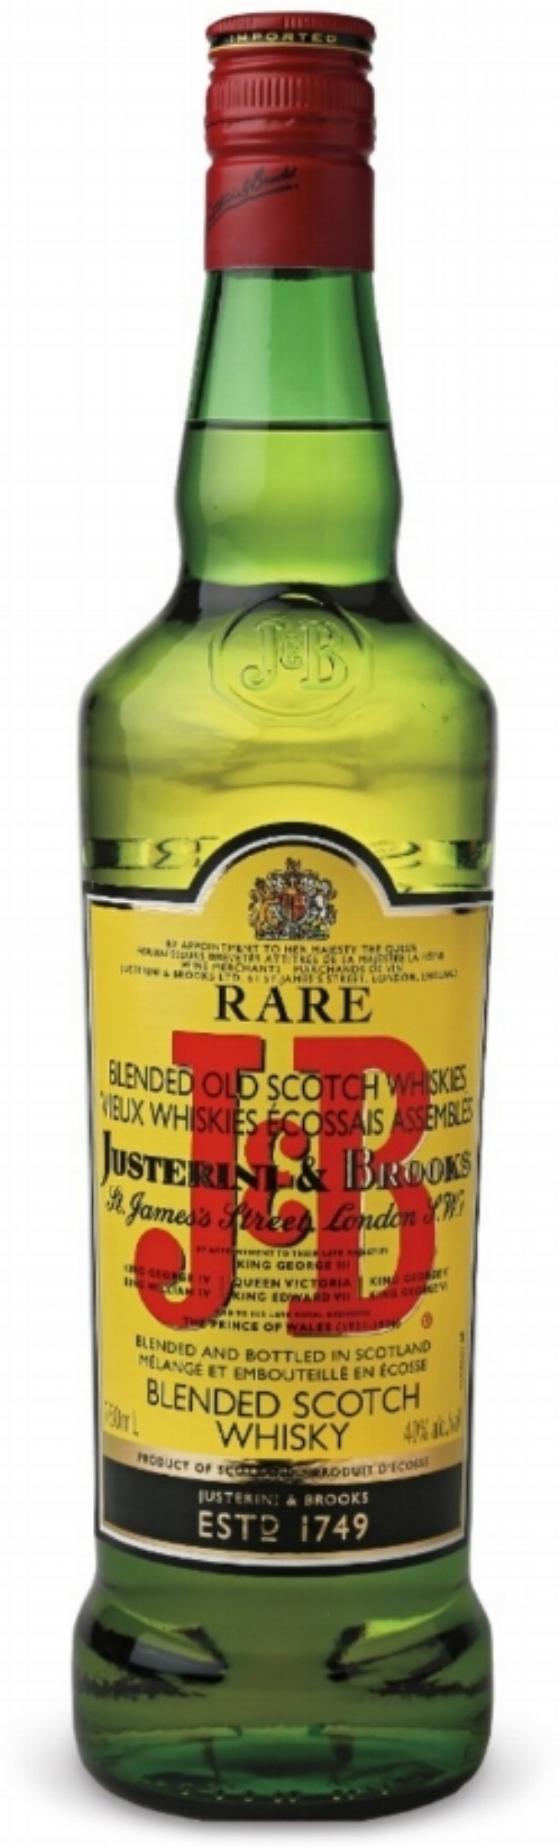 10.J&B Rare Blended Scotch Whisky